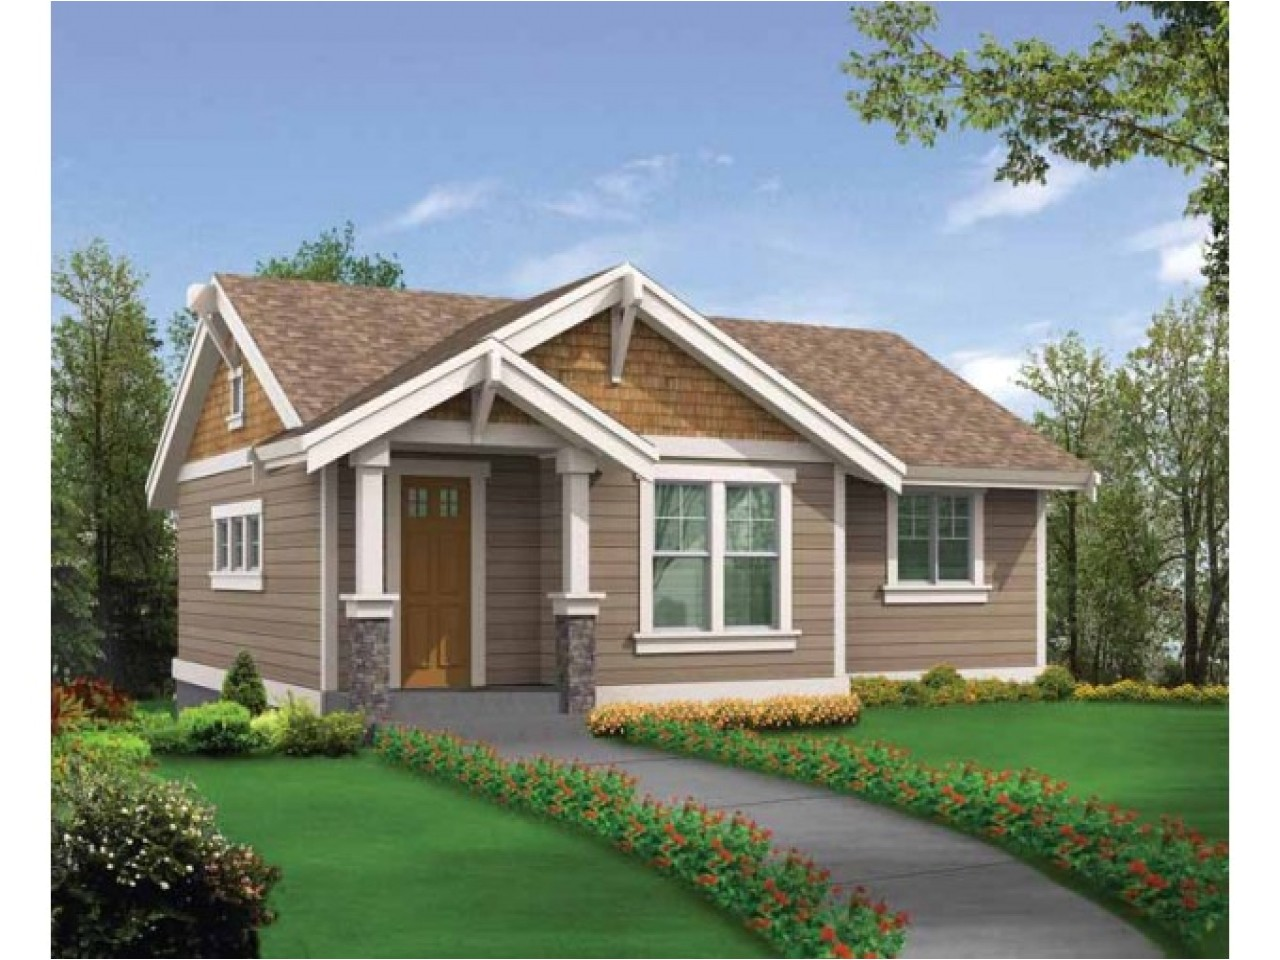 ffc0ebc1d9d1fbb0 fleetwood modular homes craftsman modular homes